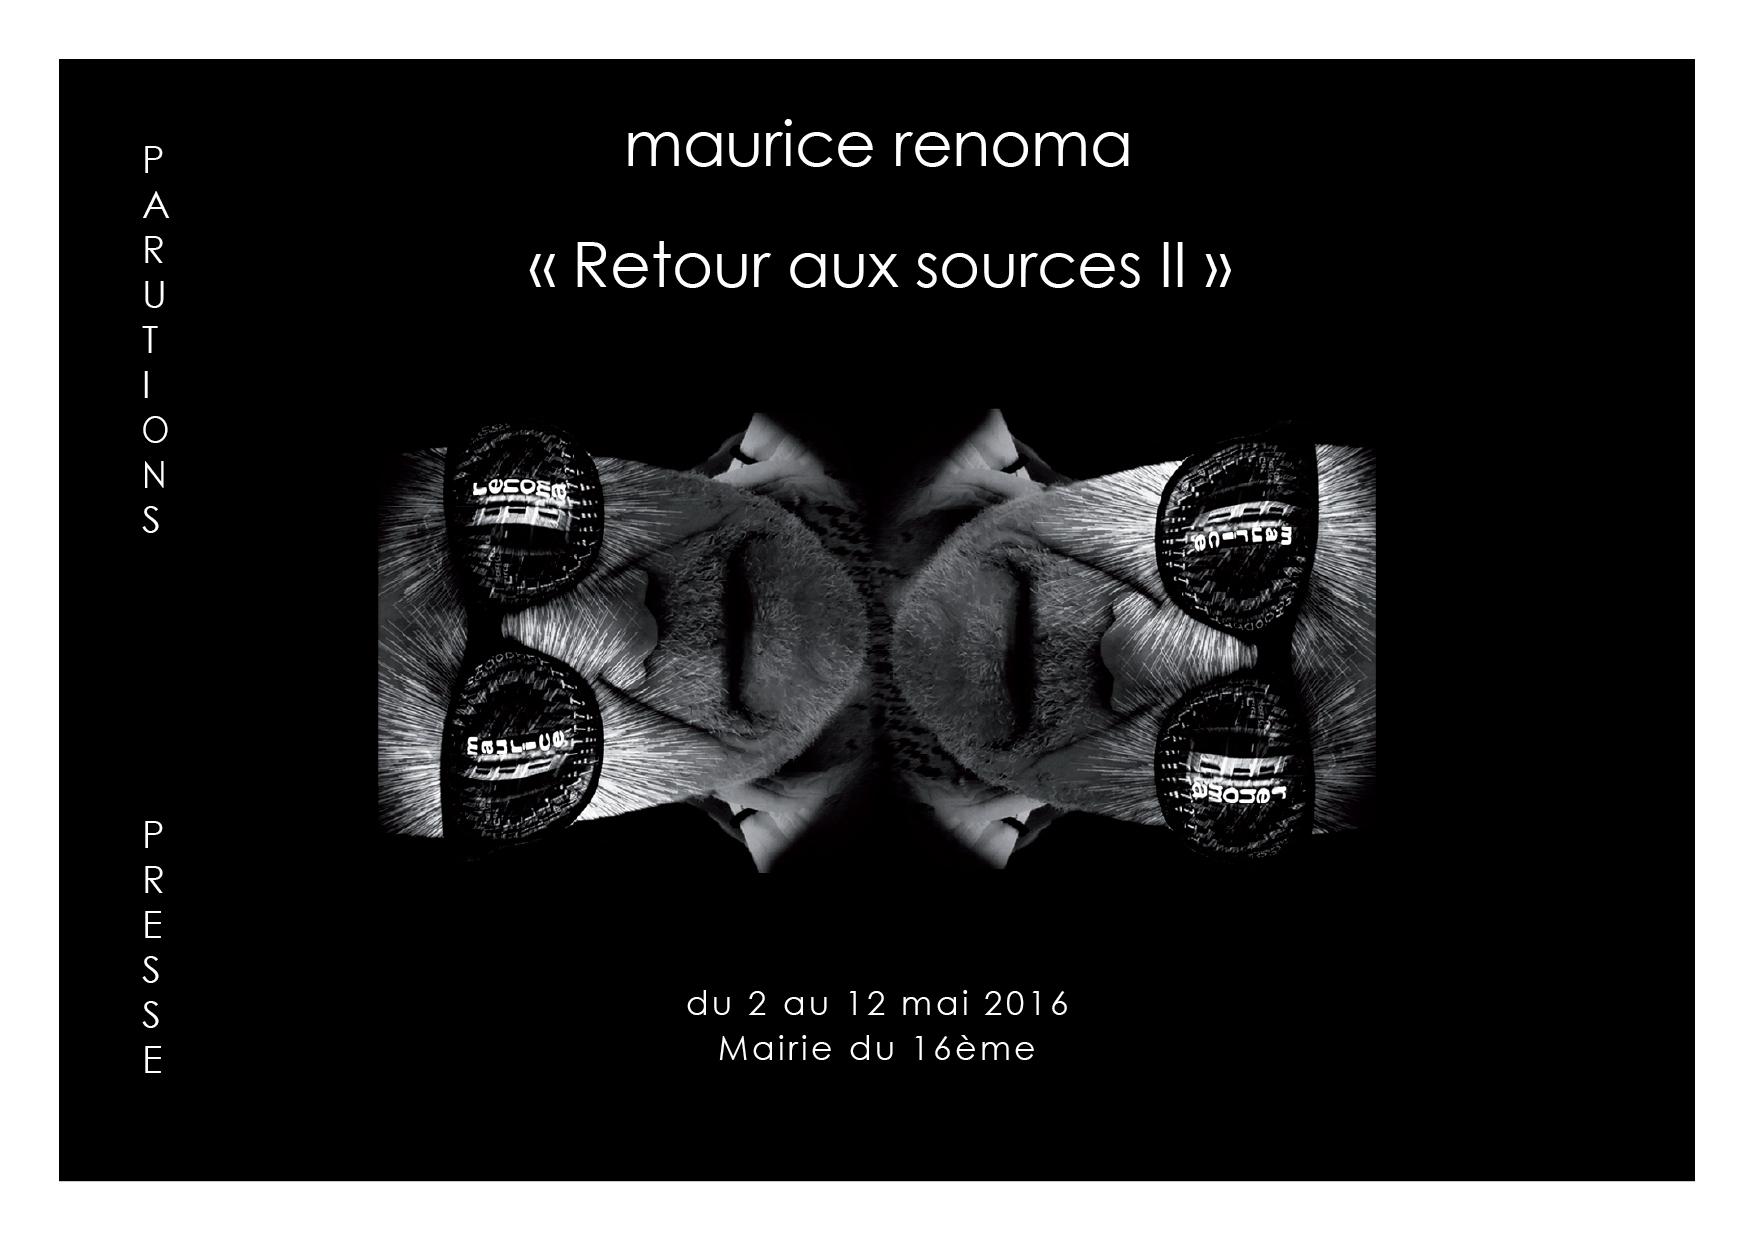 PRESSE_BOOK_RETOURAUXSOURCESII